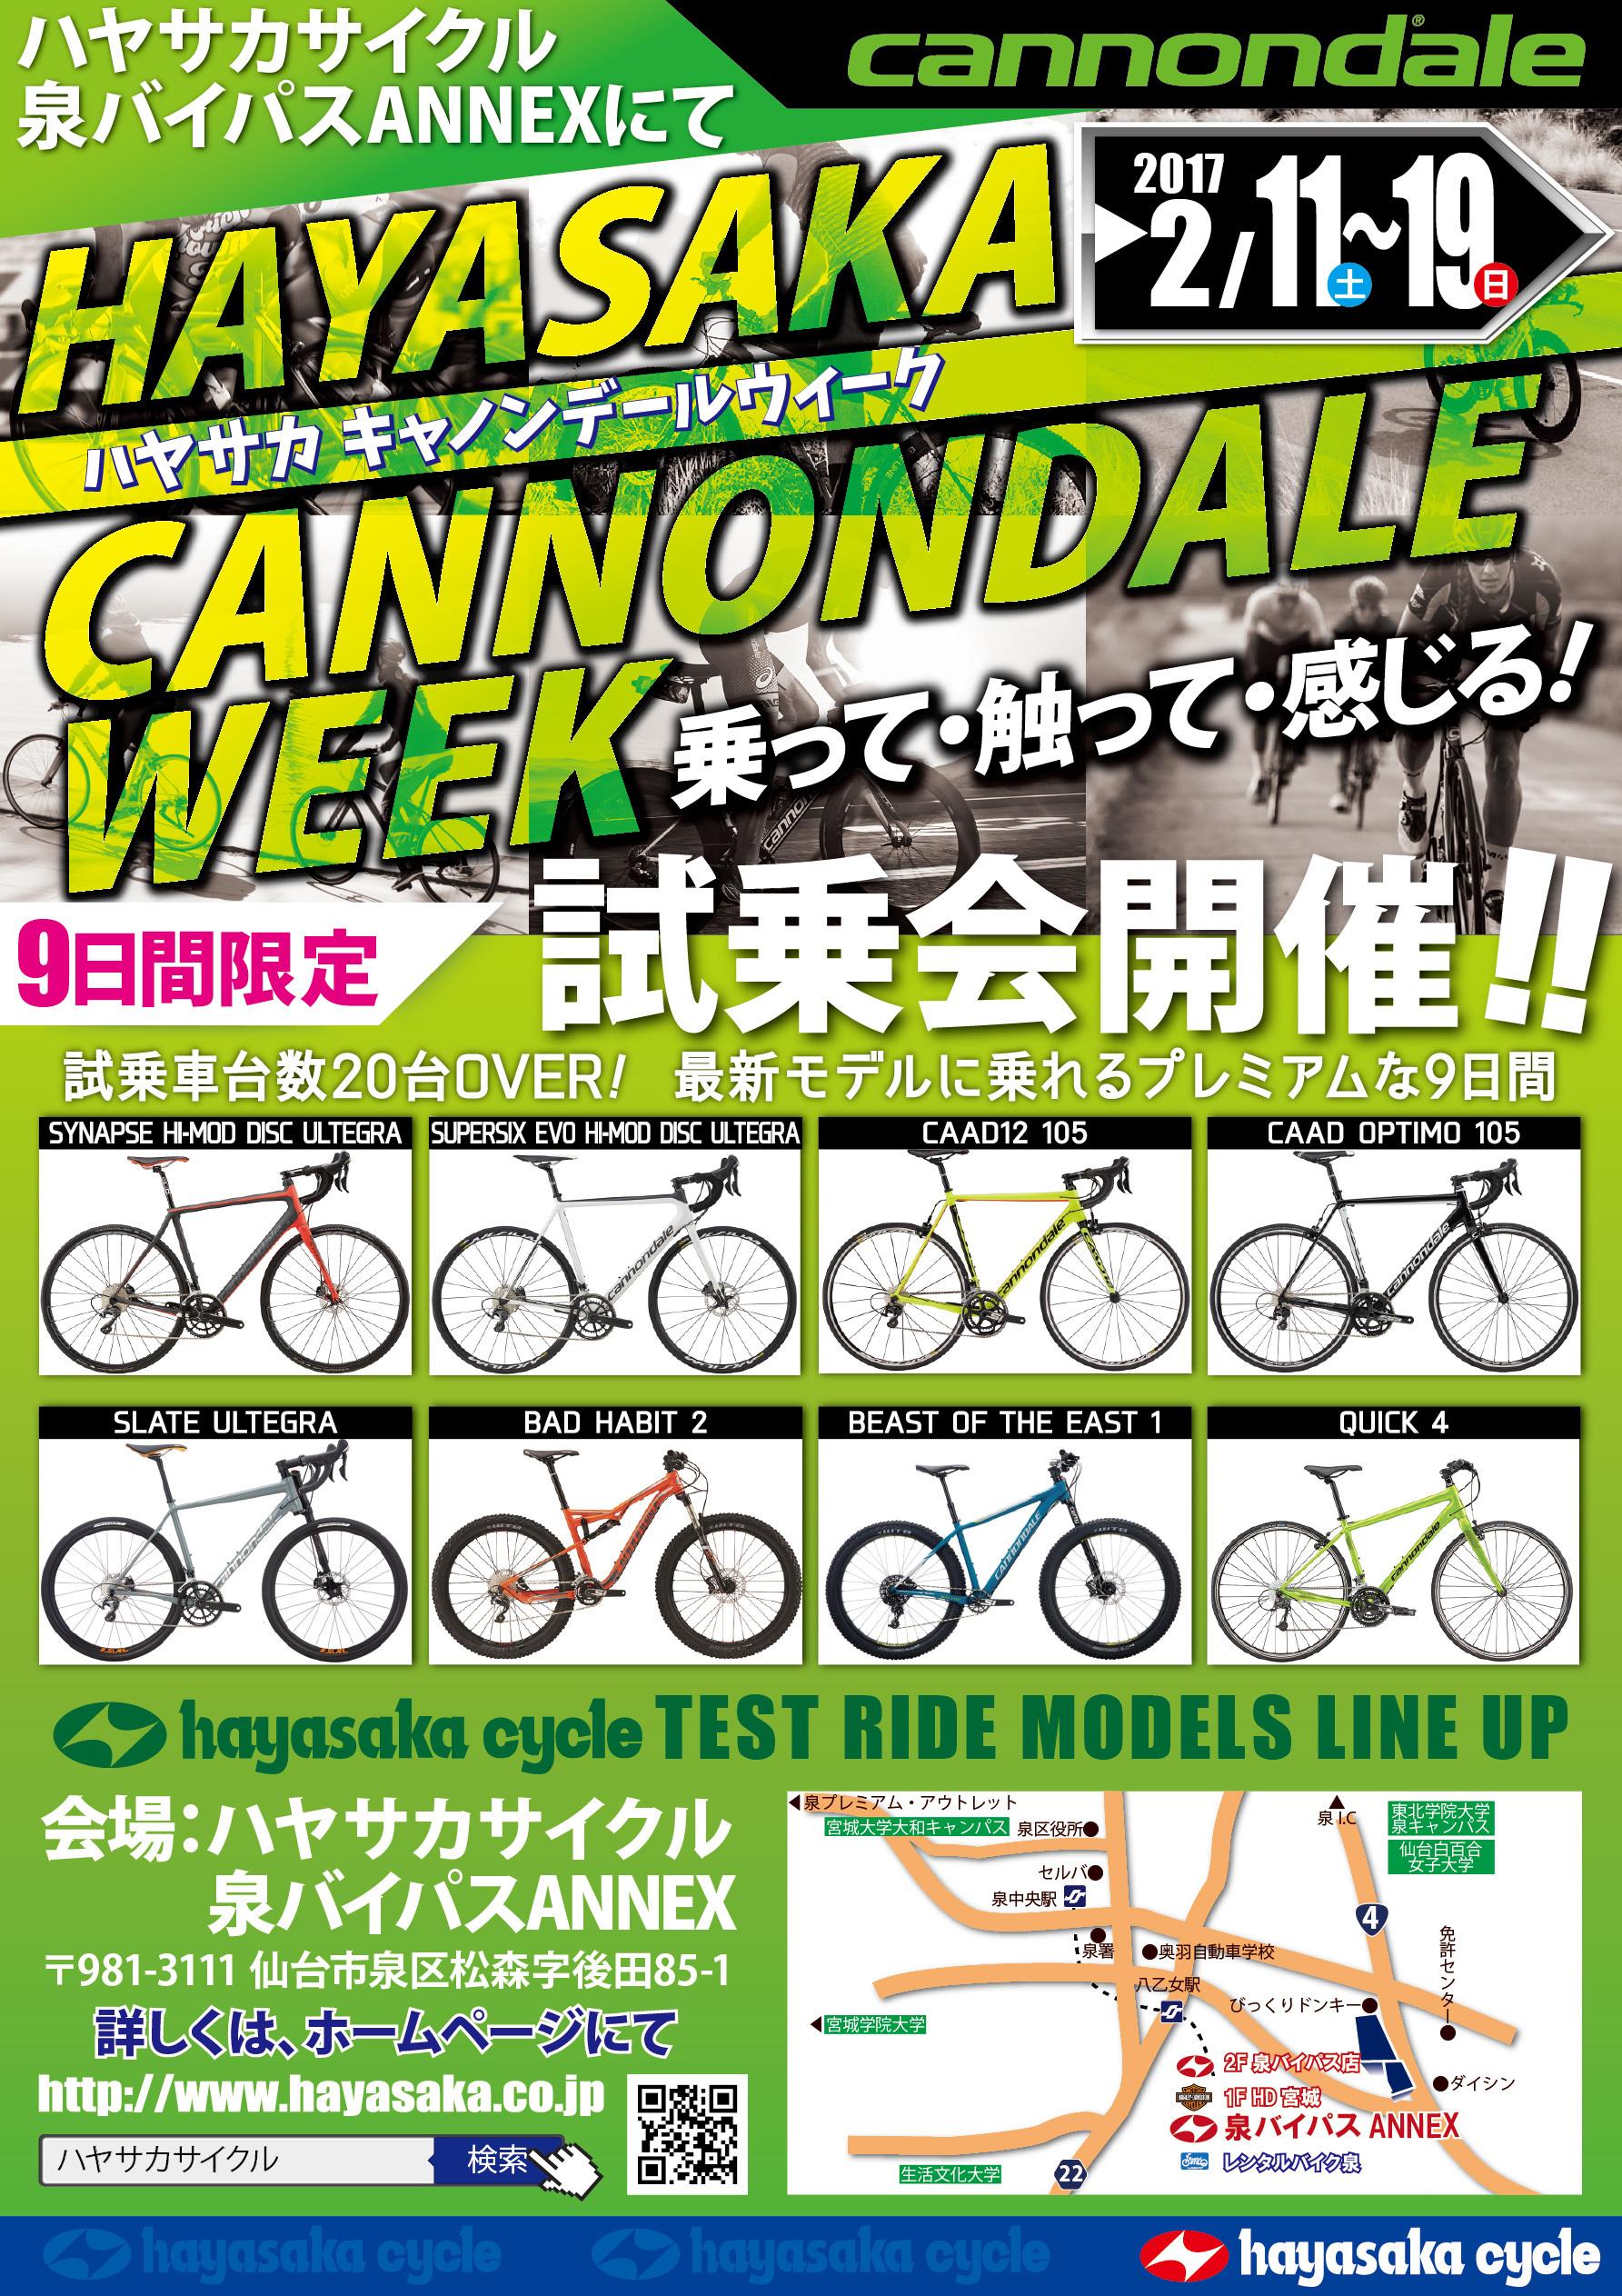 201602hayasaka-cannondale-week3_20170205104722c03.jpg